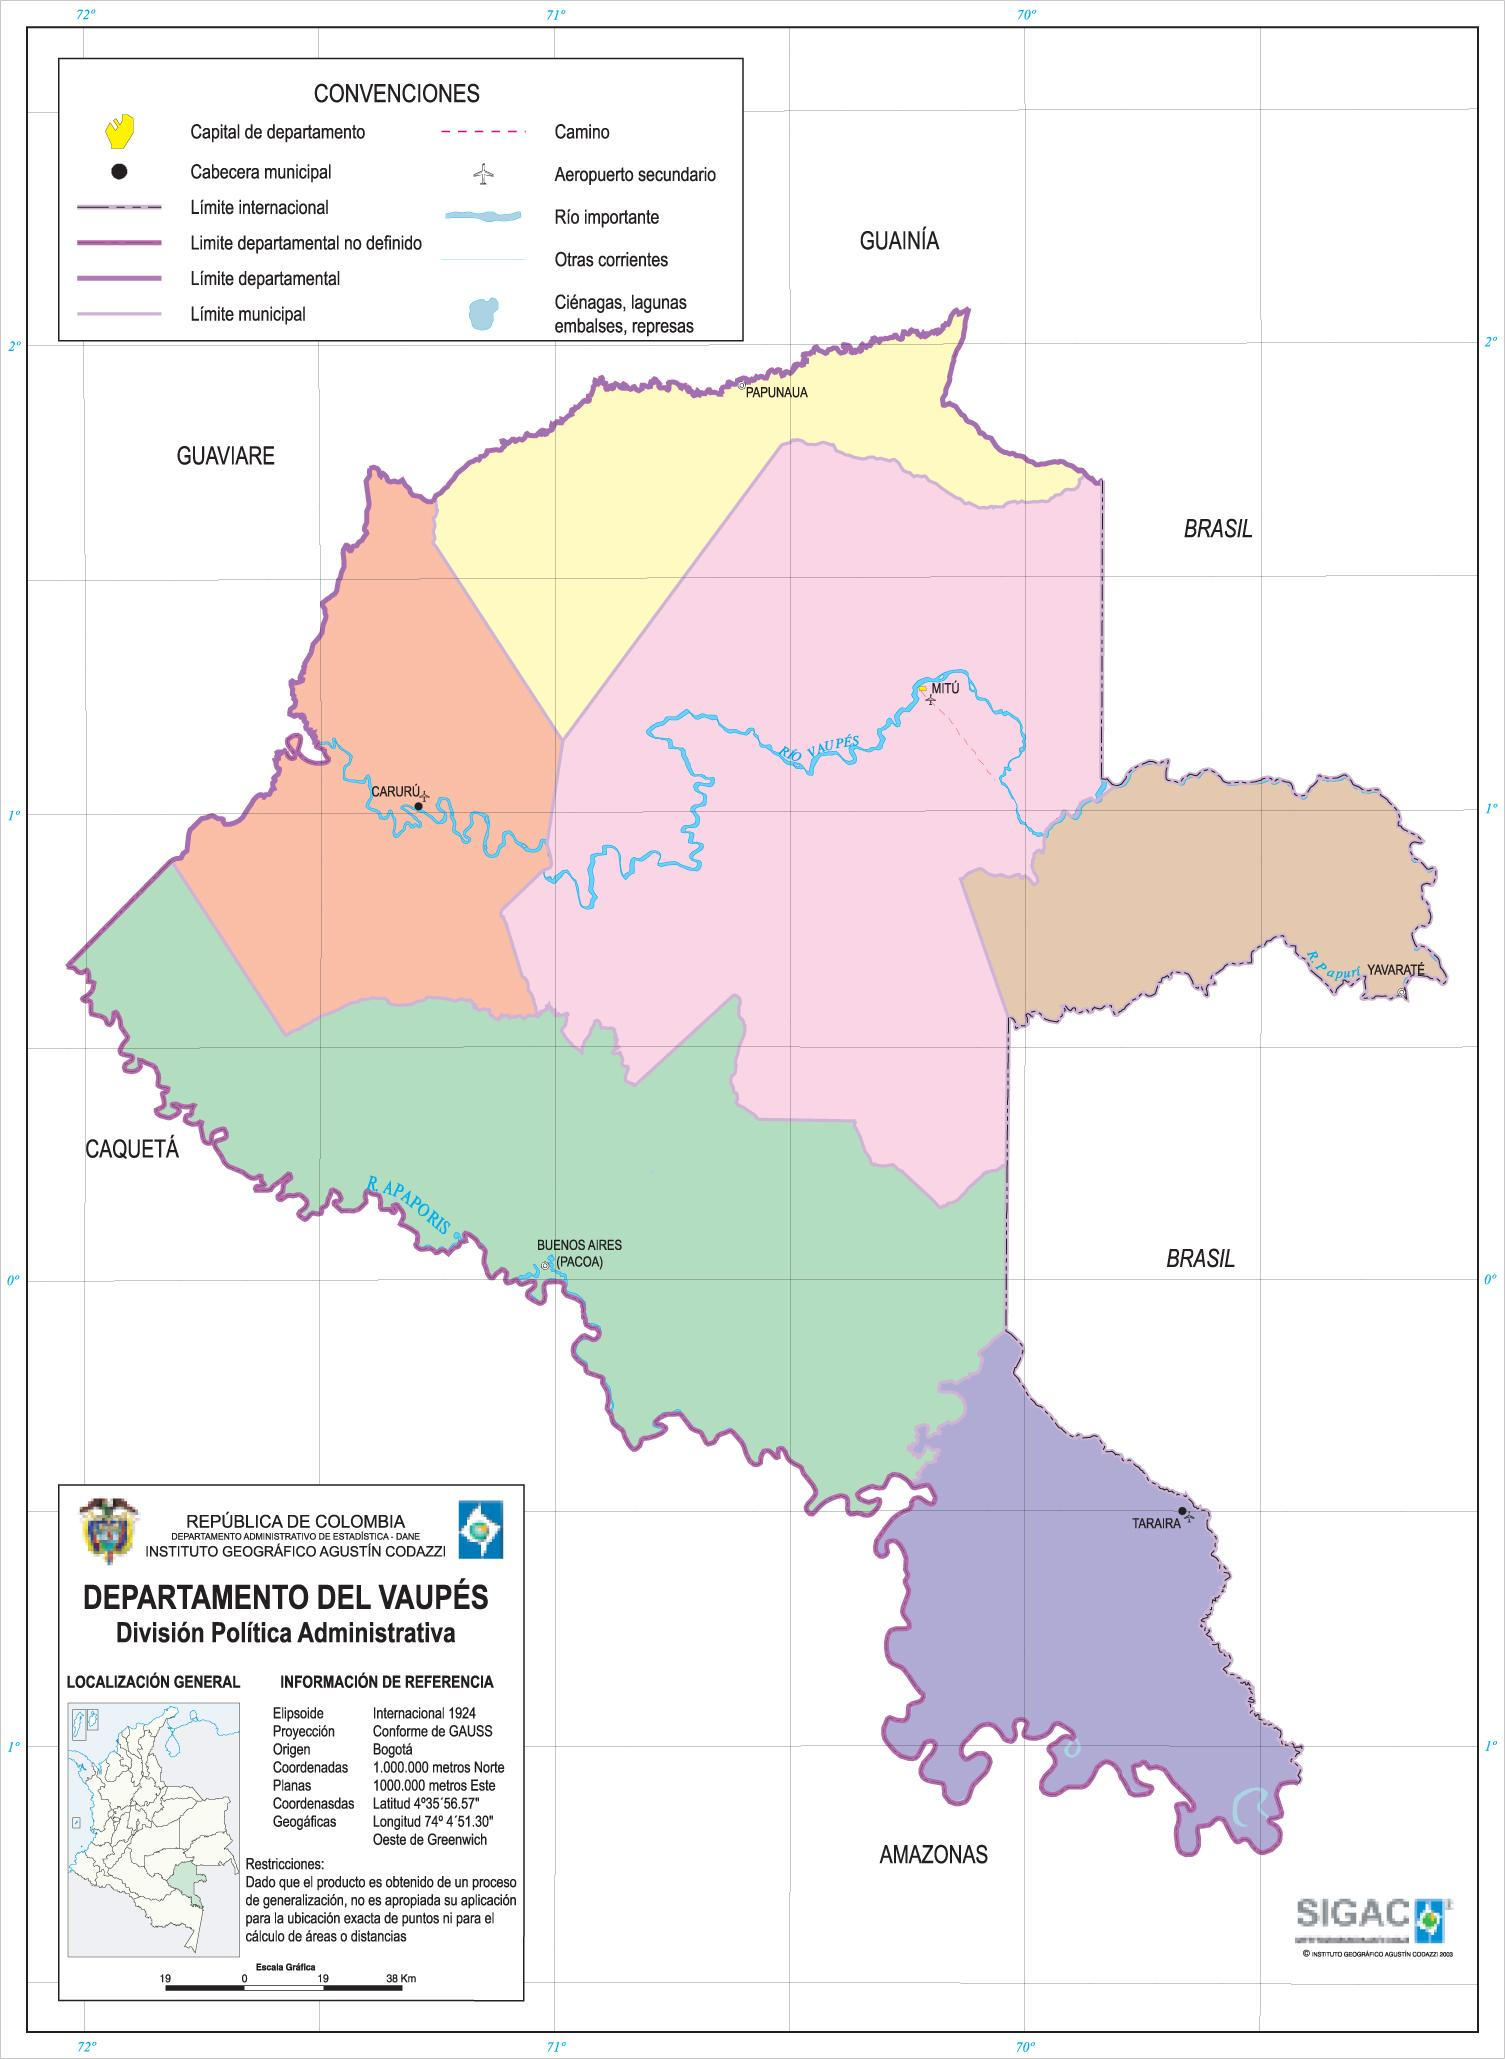 Mapa del Departamento del Vaupés, Colombia